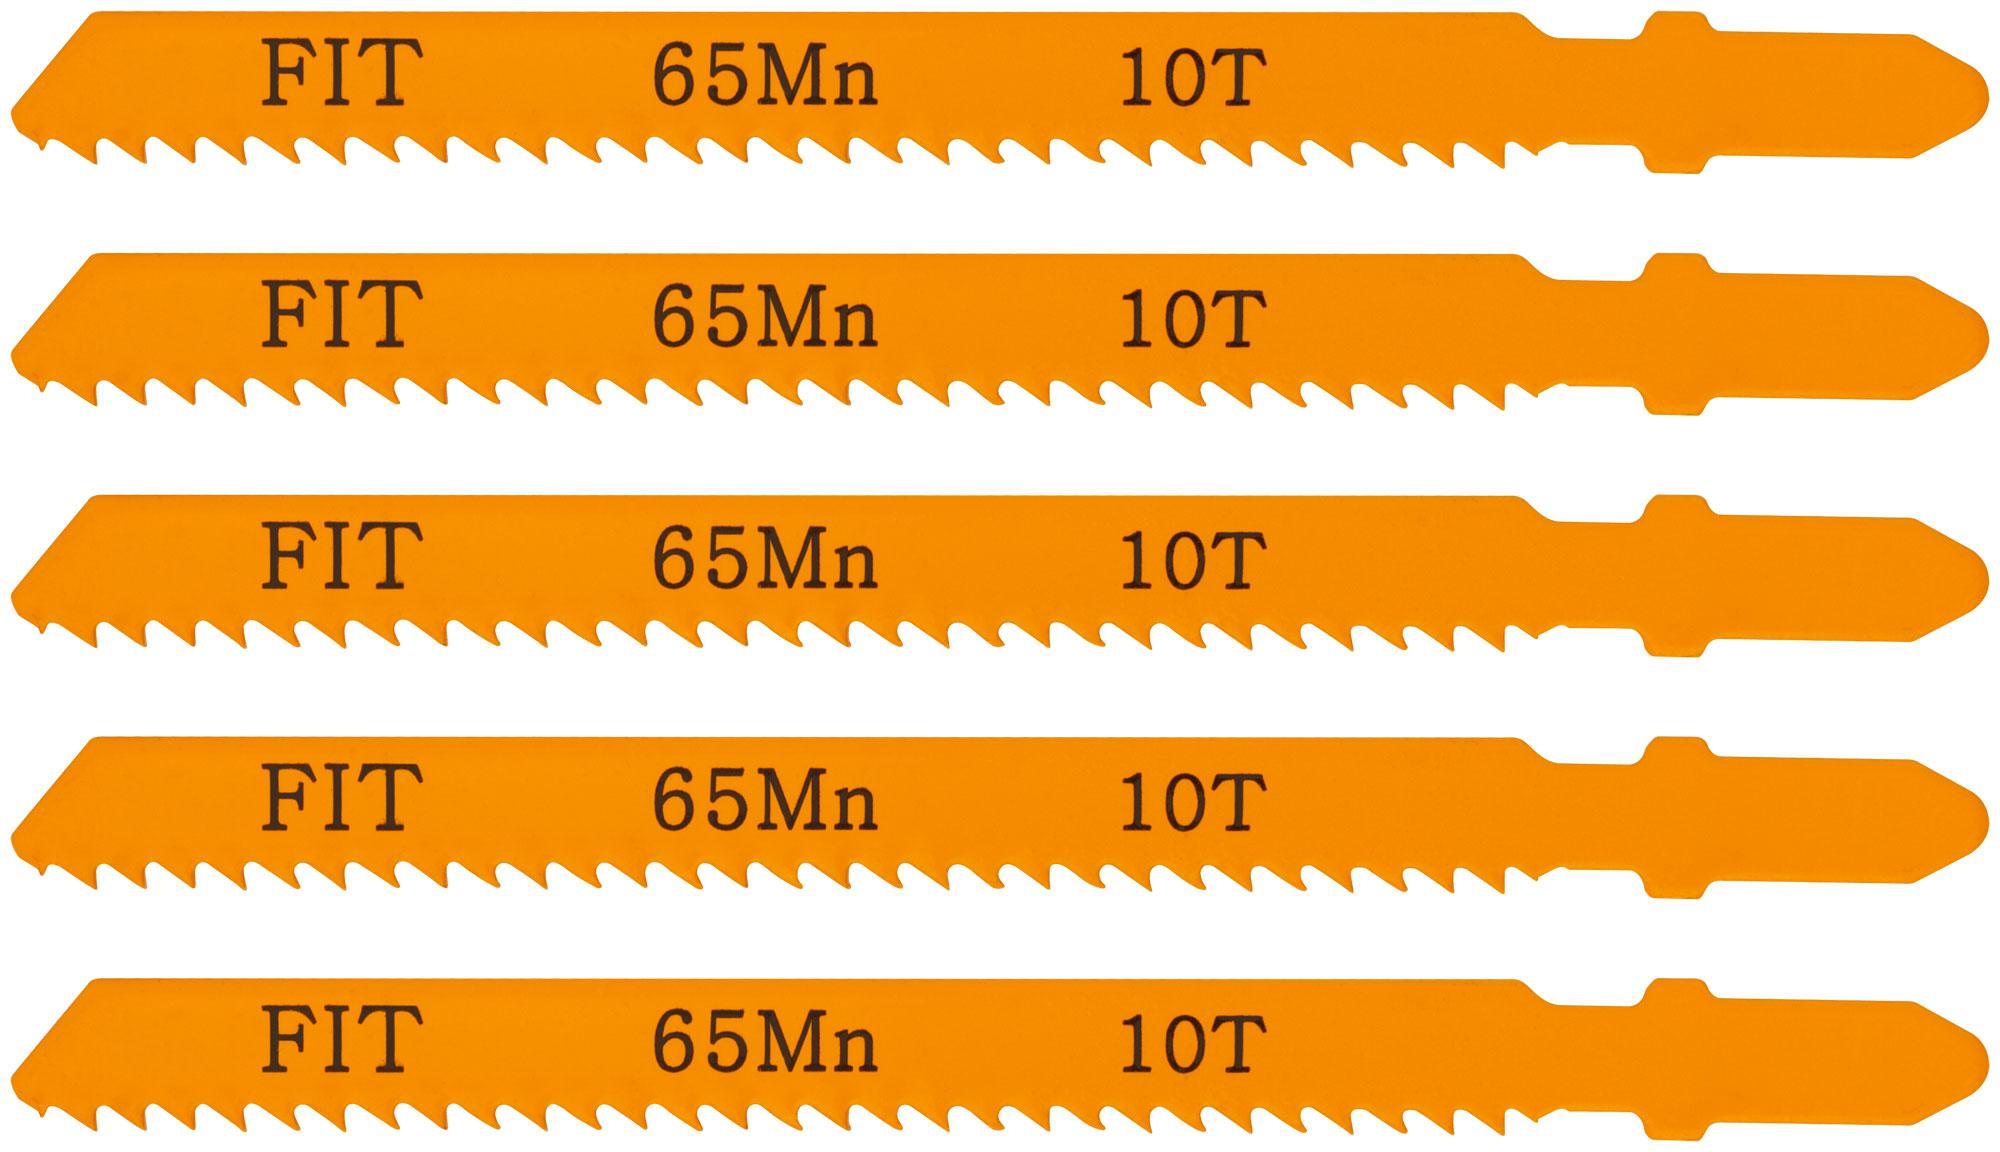 Пилки для лобзика Fit 41106 пилки для лобзика по дереву набор 5 шт стандарт